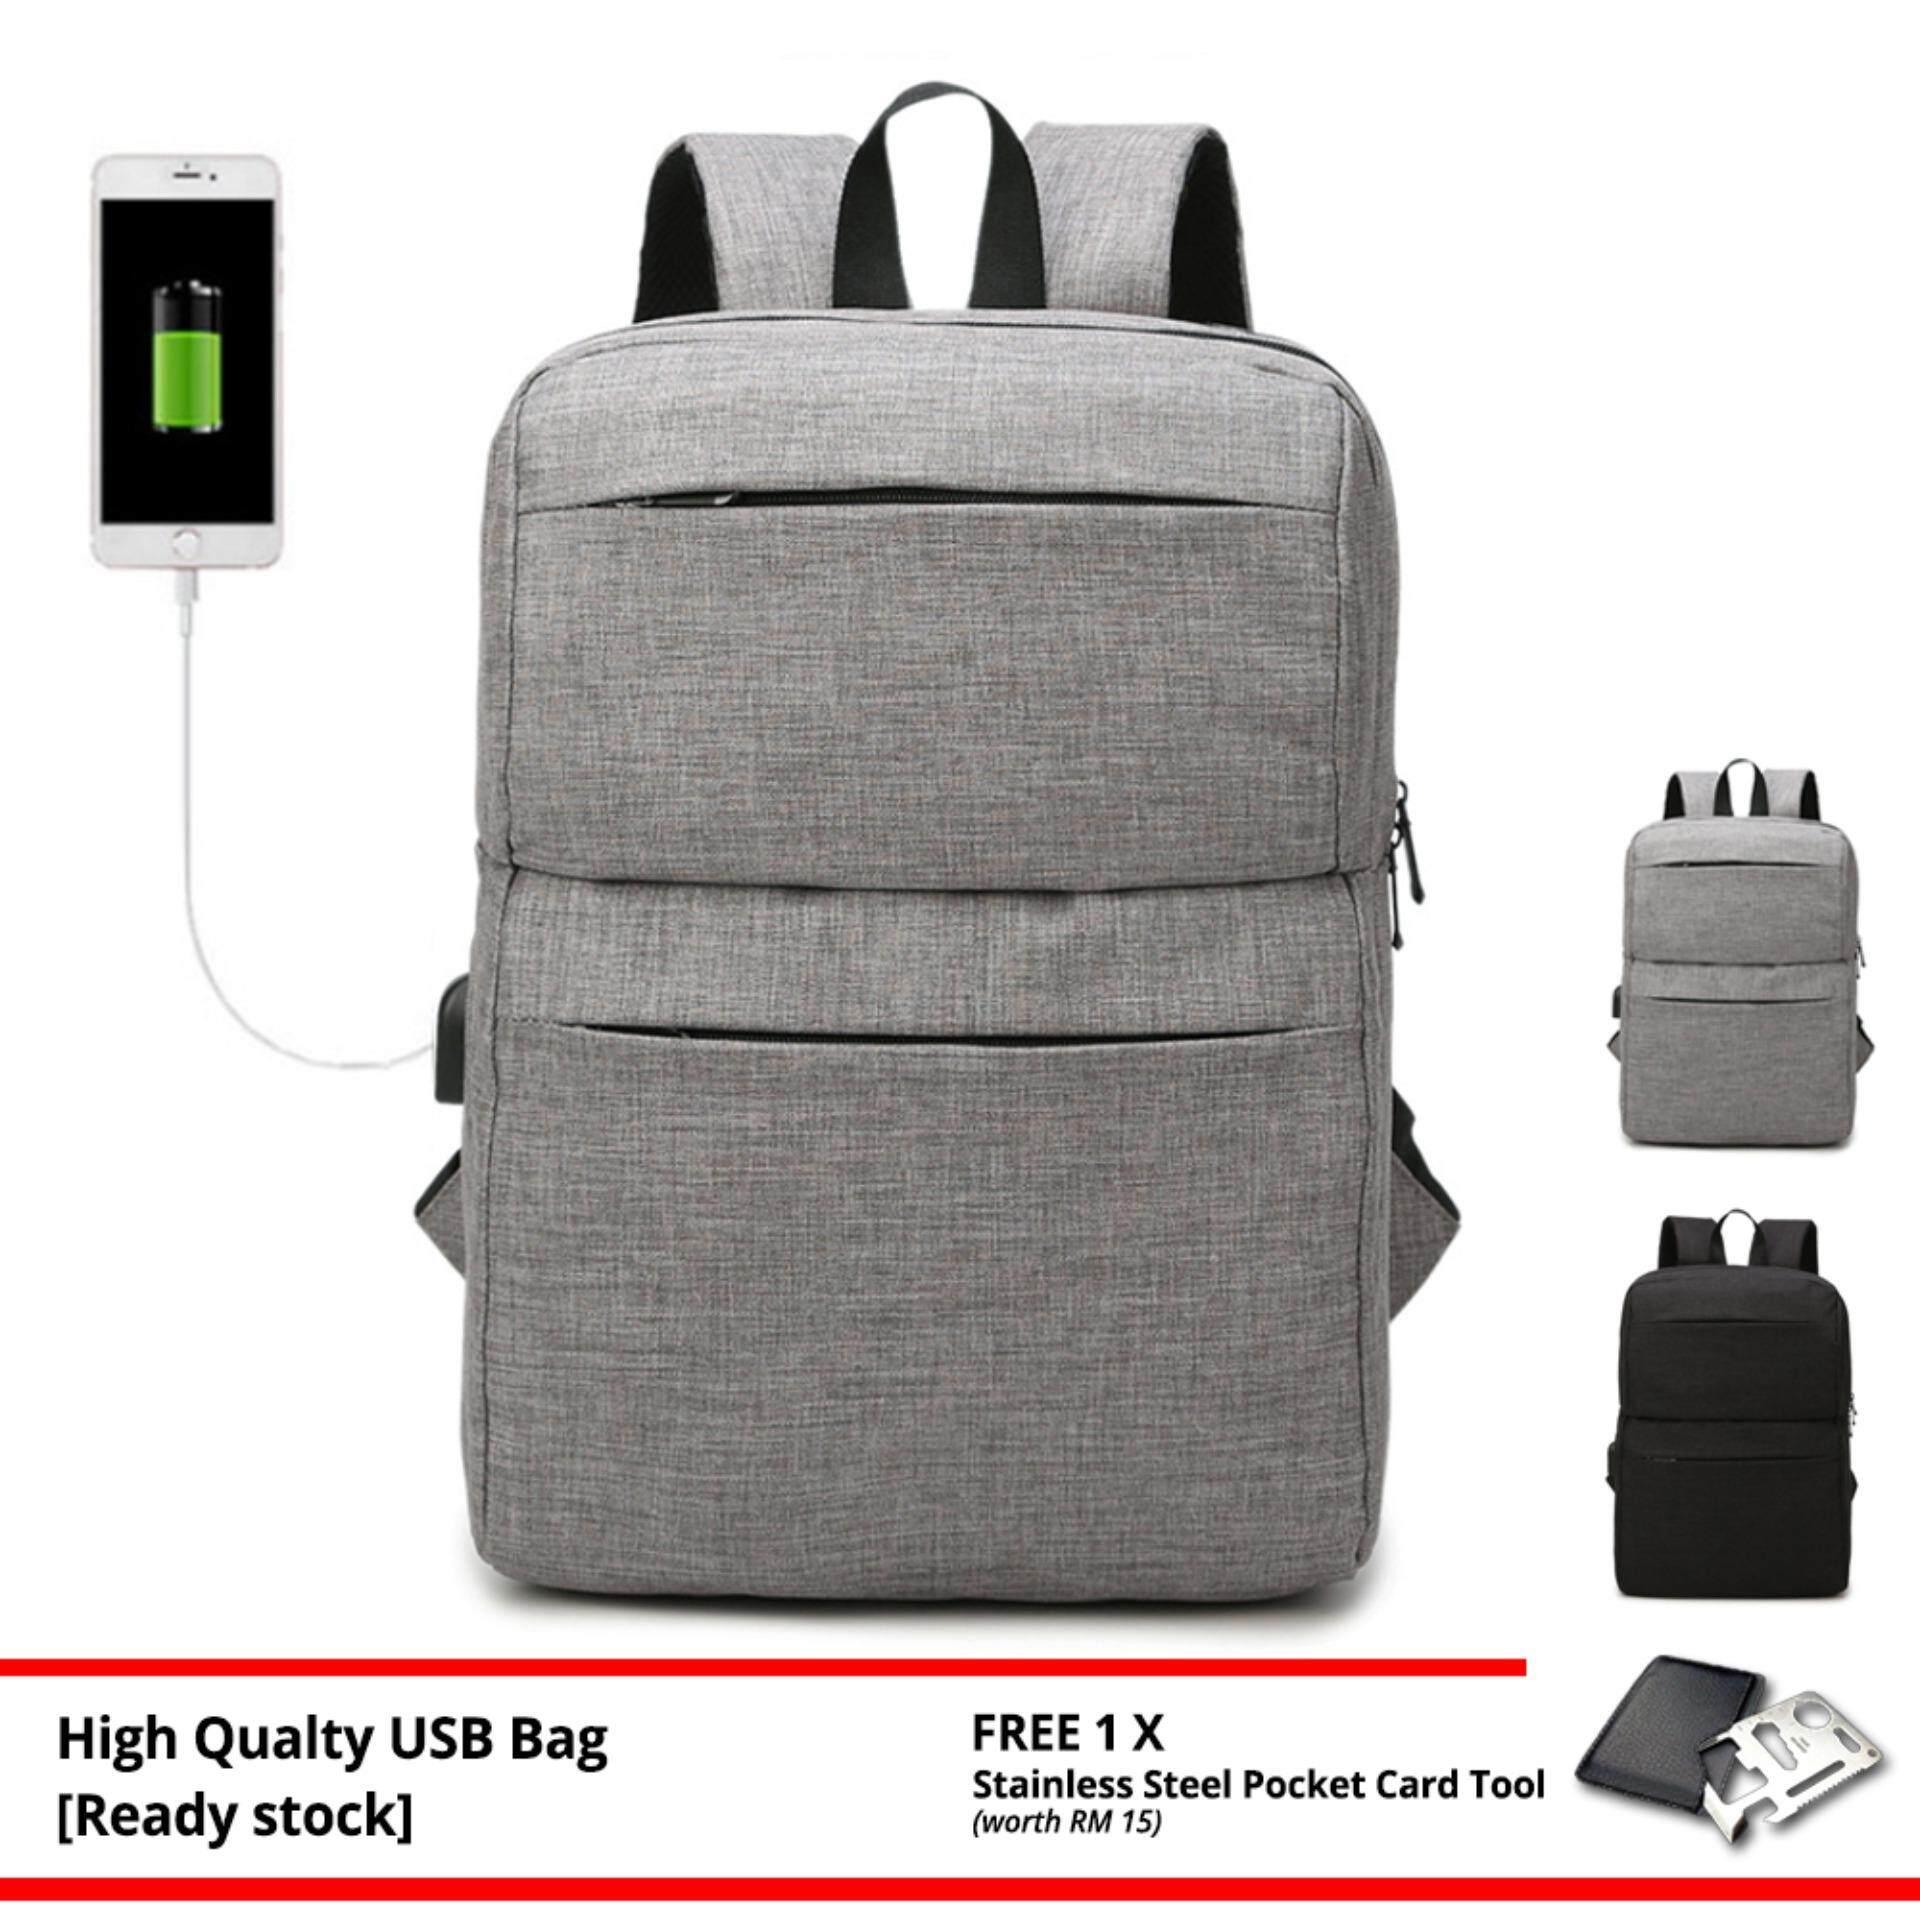 Durable Multipurpose USB Charging Backpack Design Trendy Travel Laptop Bag 138 MI1382